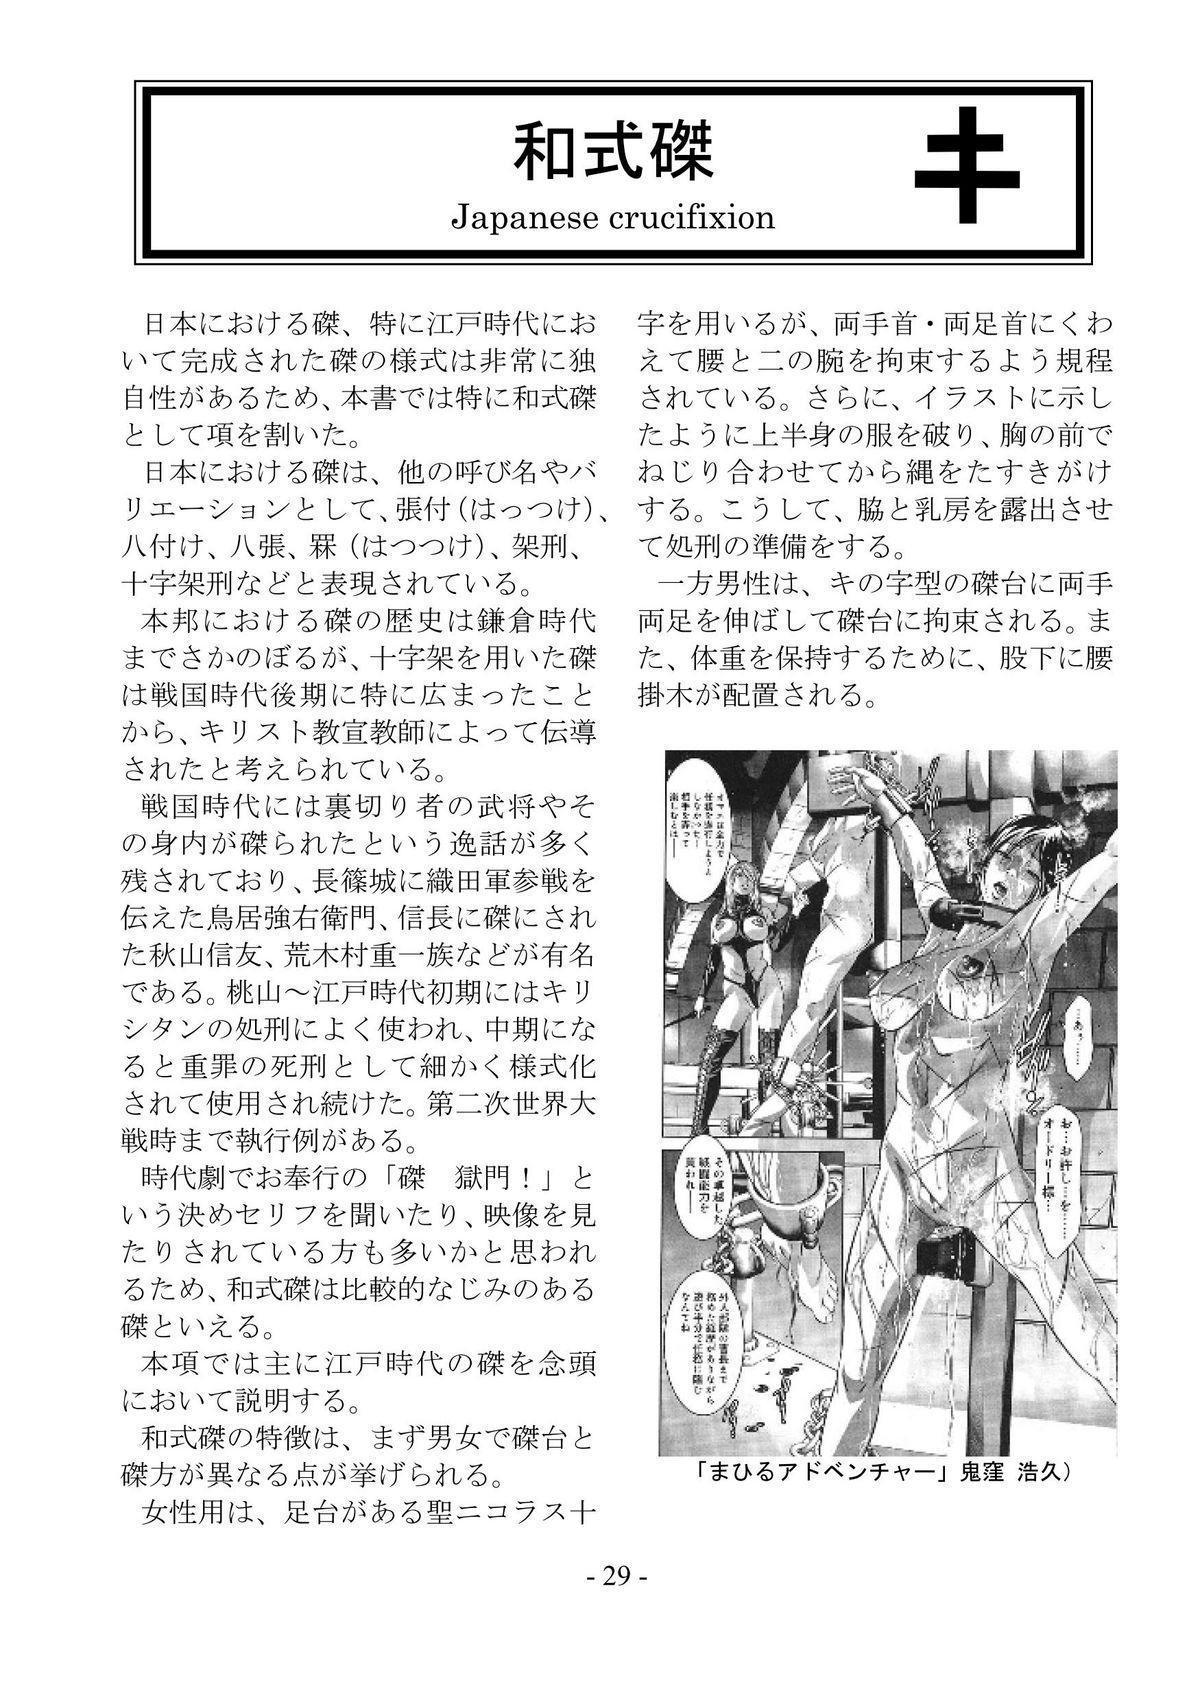 encyclopedia of crucifixion 29